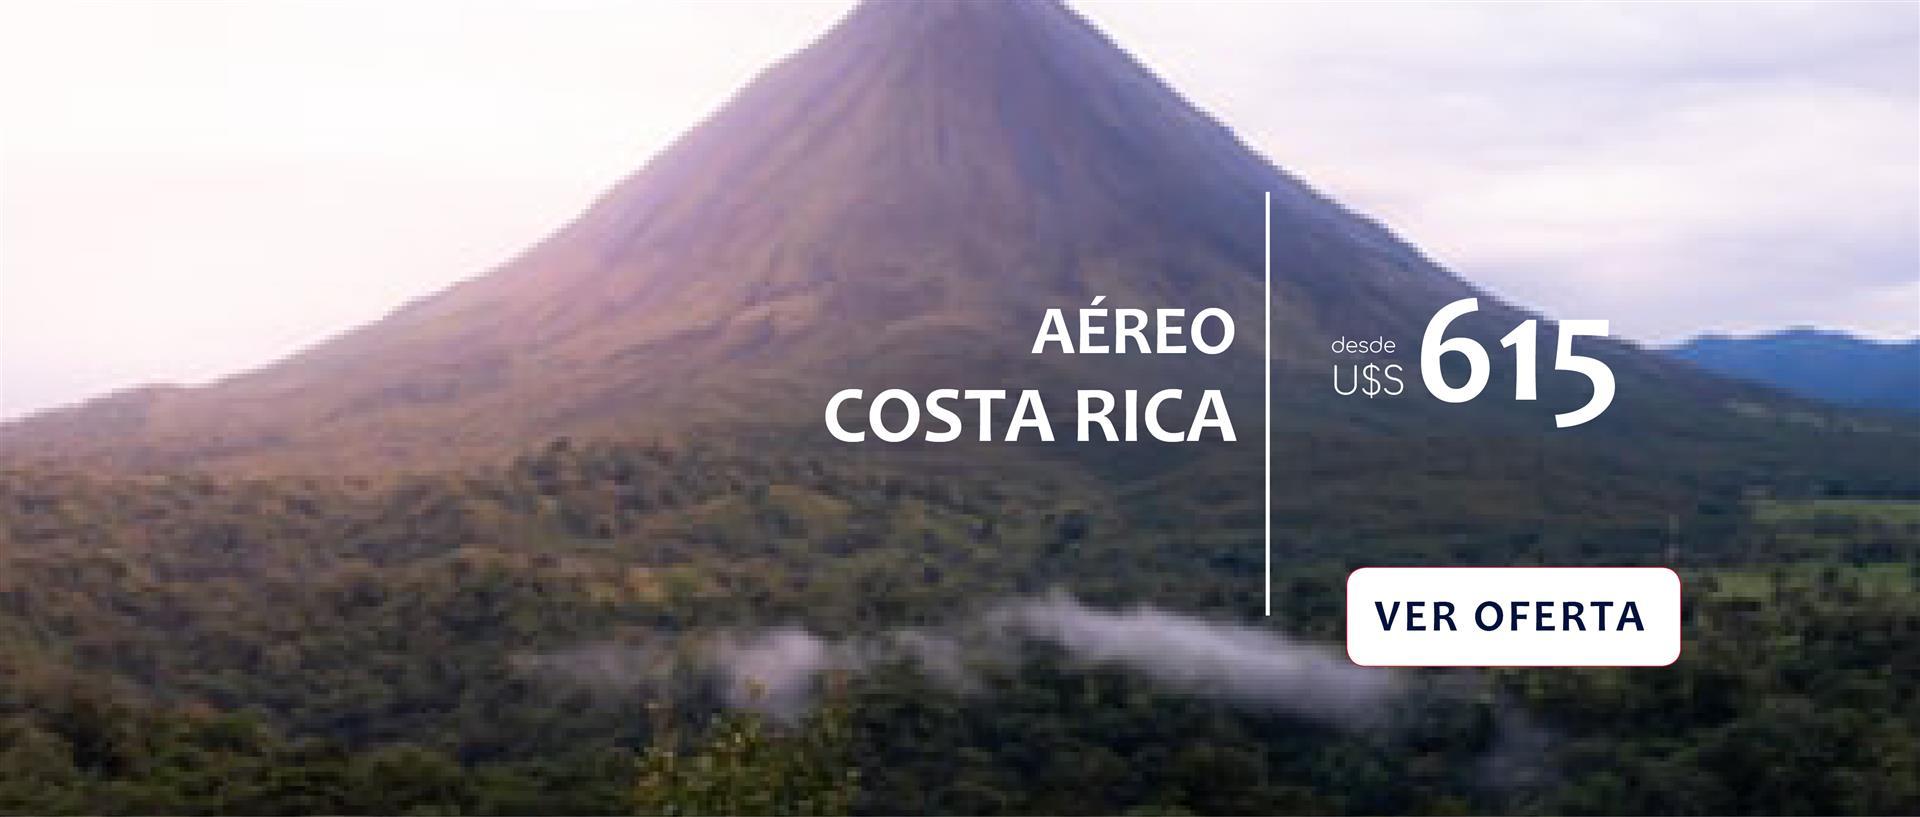 Aéreo Costa Rica